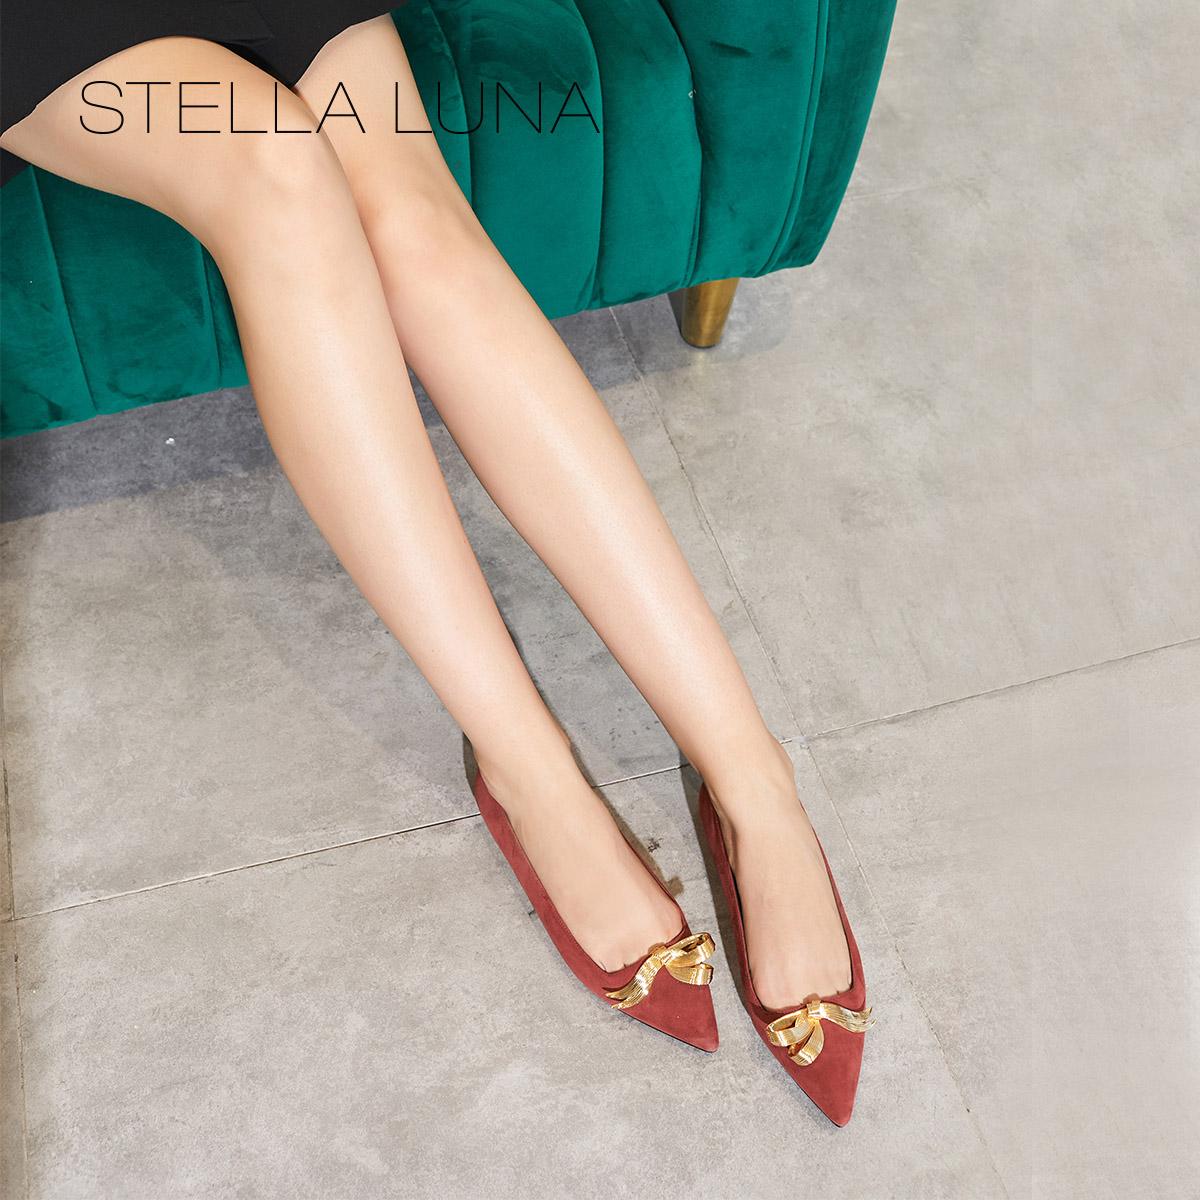 STELLA LUNA18秋季新款羊反毛浅口优雅尖头平底鞋chic通勤女单鞋